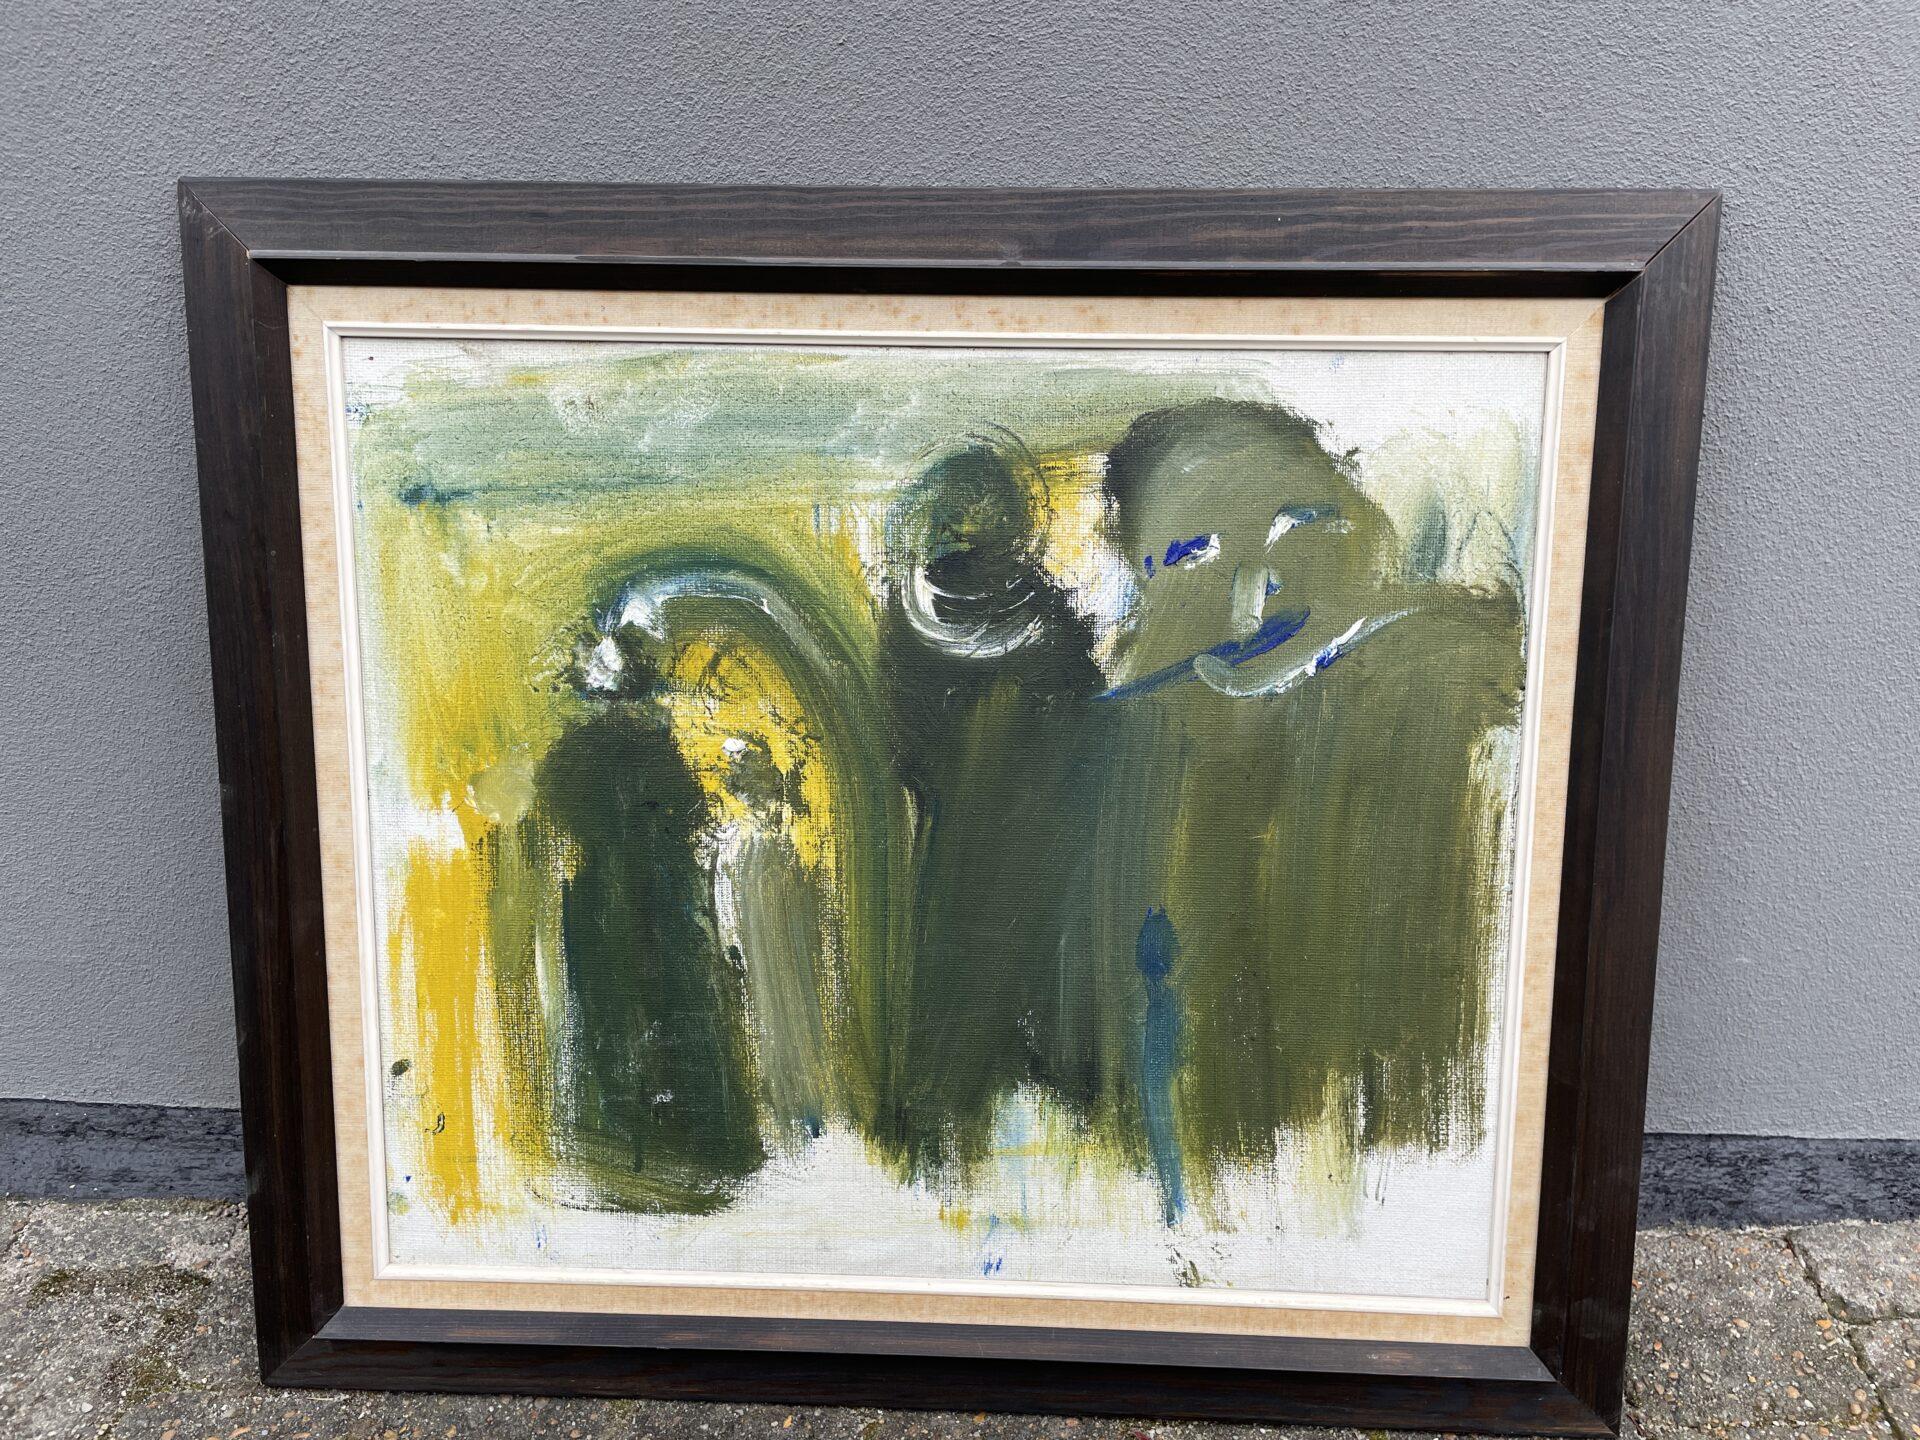 Svend Åge Taucher, u. sign. rammemål 64x75 cn, pris 500kr